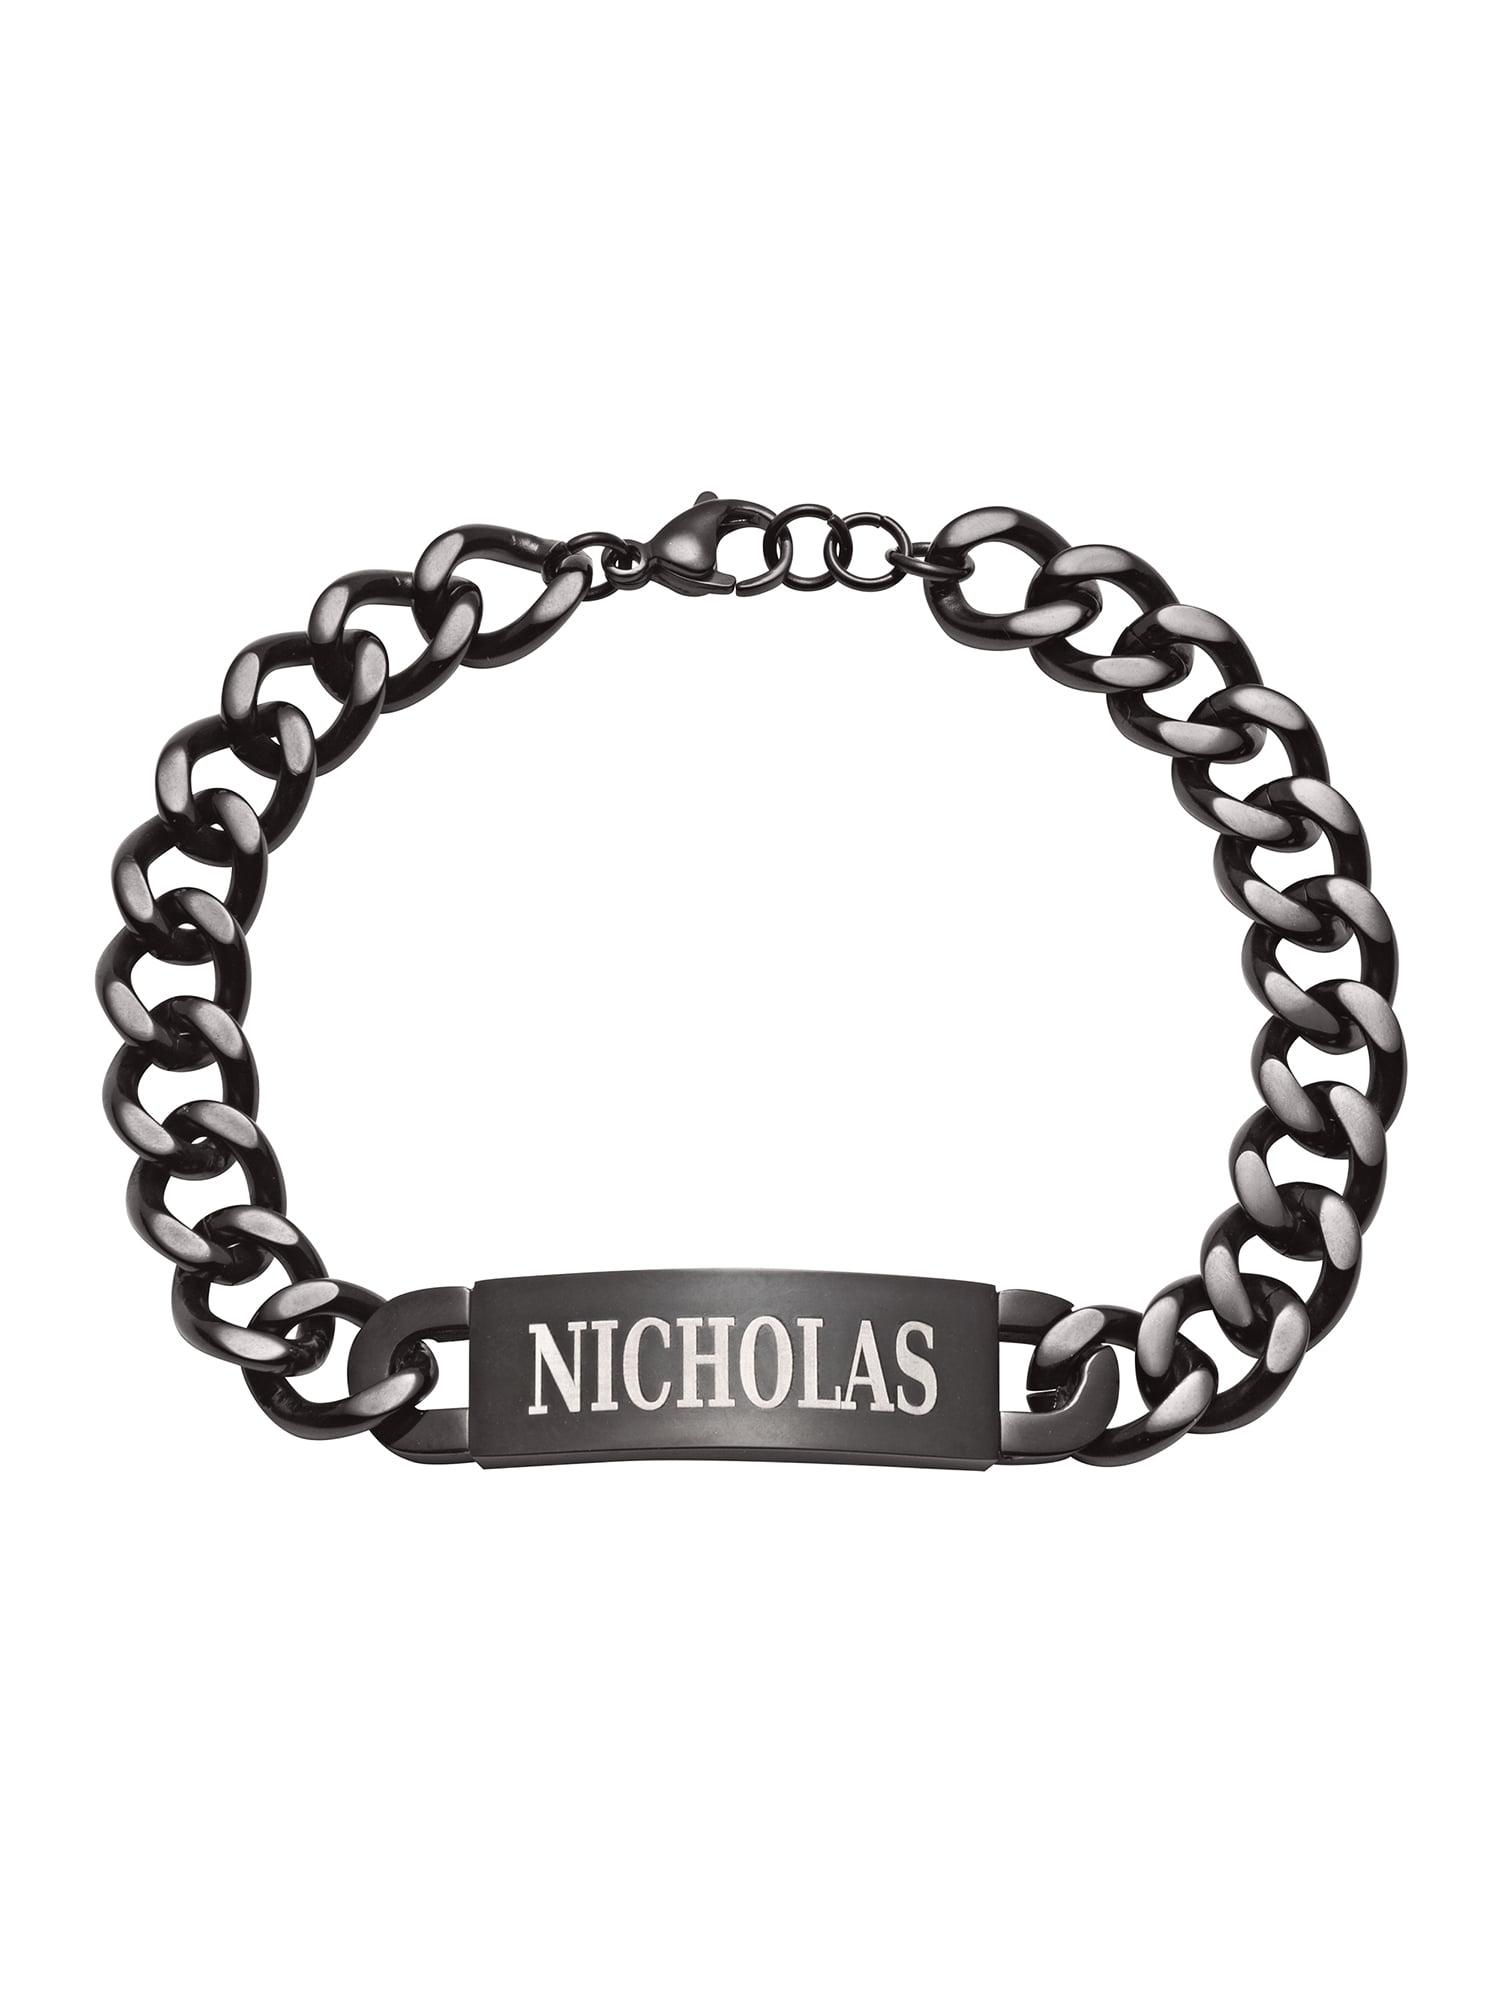 Personalized Men's Black Stainless Steel ID Bracelet